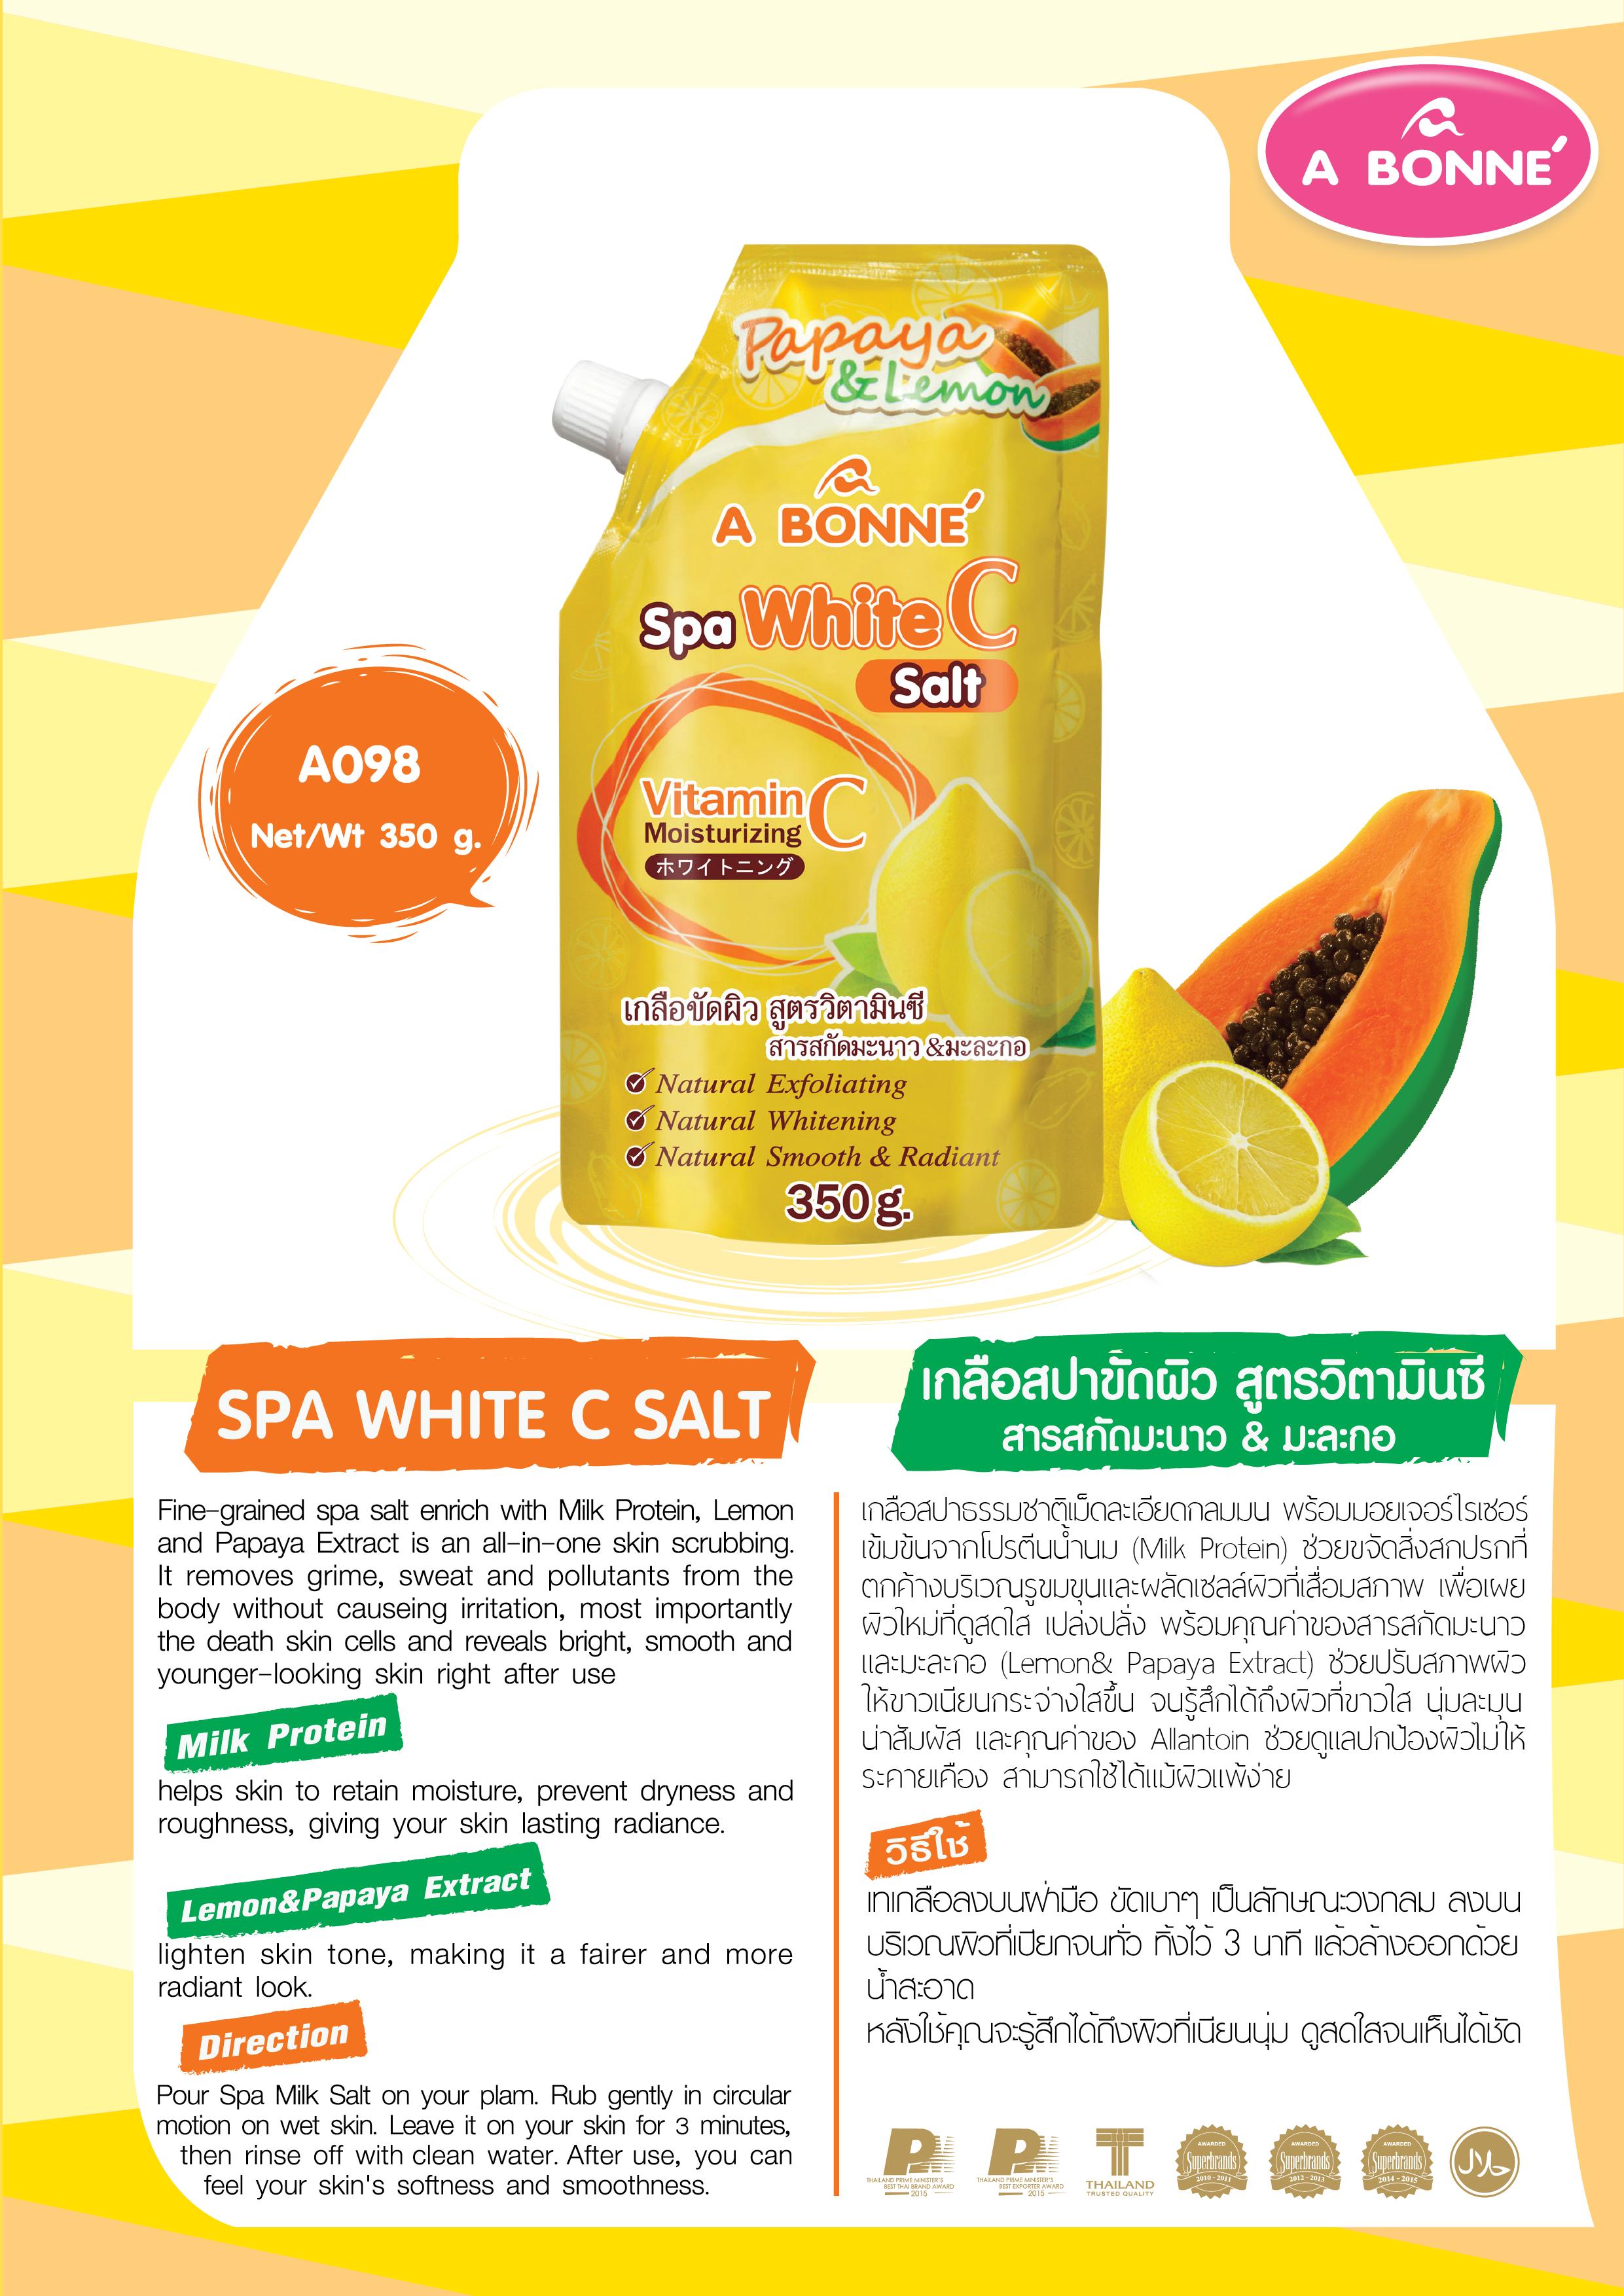 Spa White C Salt 350g